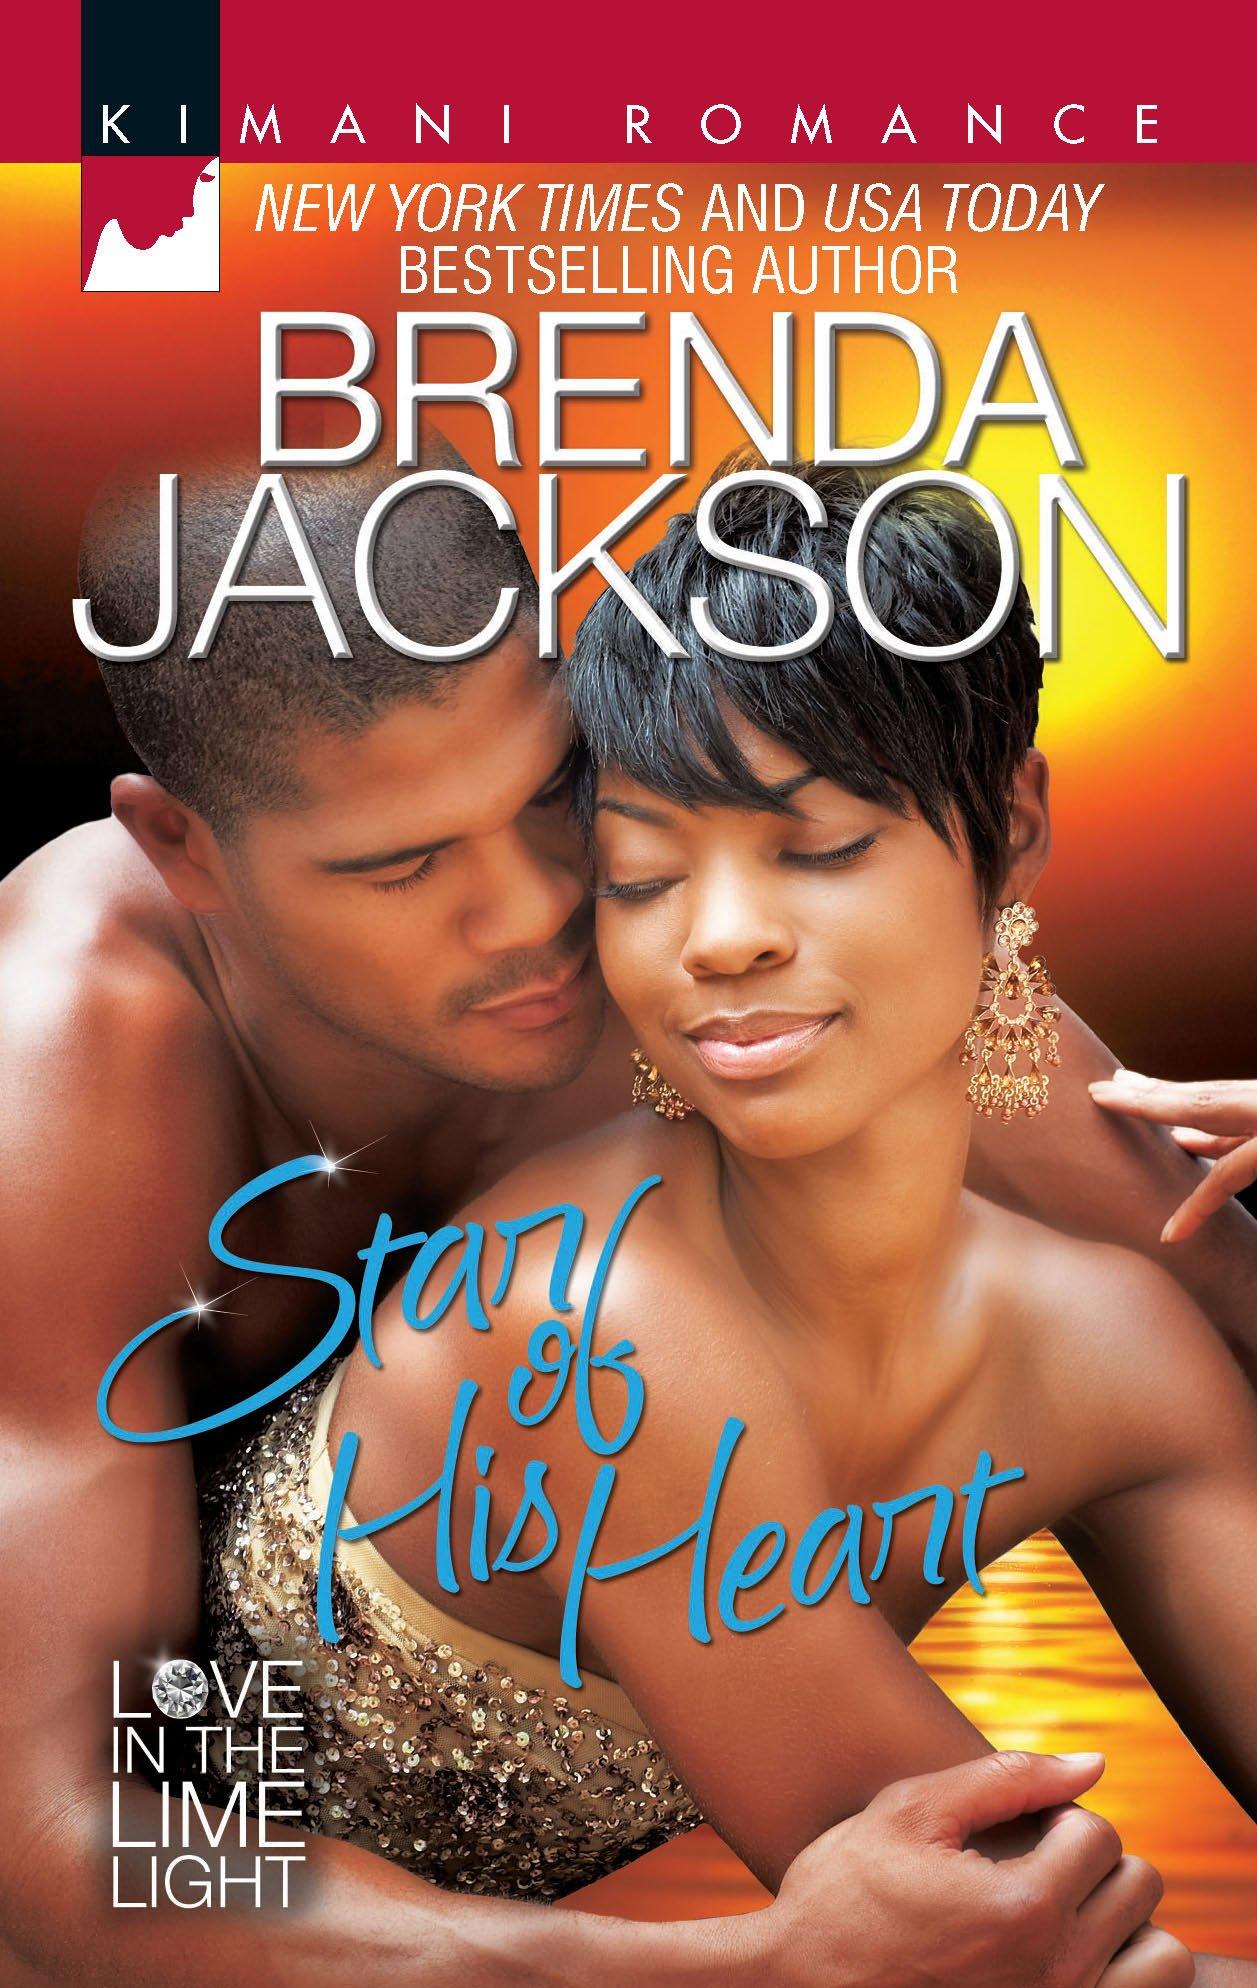 Star of His Heart (Kimani Romance): Amazon.co.uk: Brenda Jackson:  9780373861729: Books